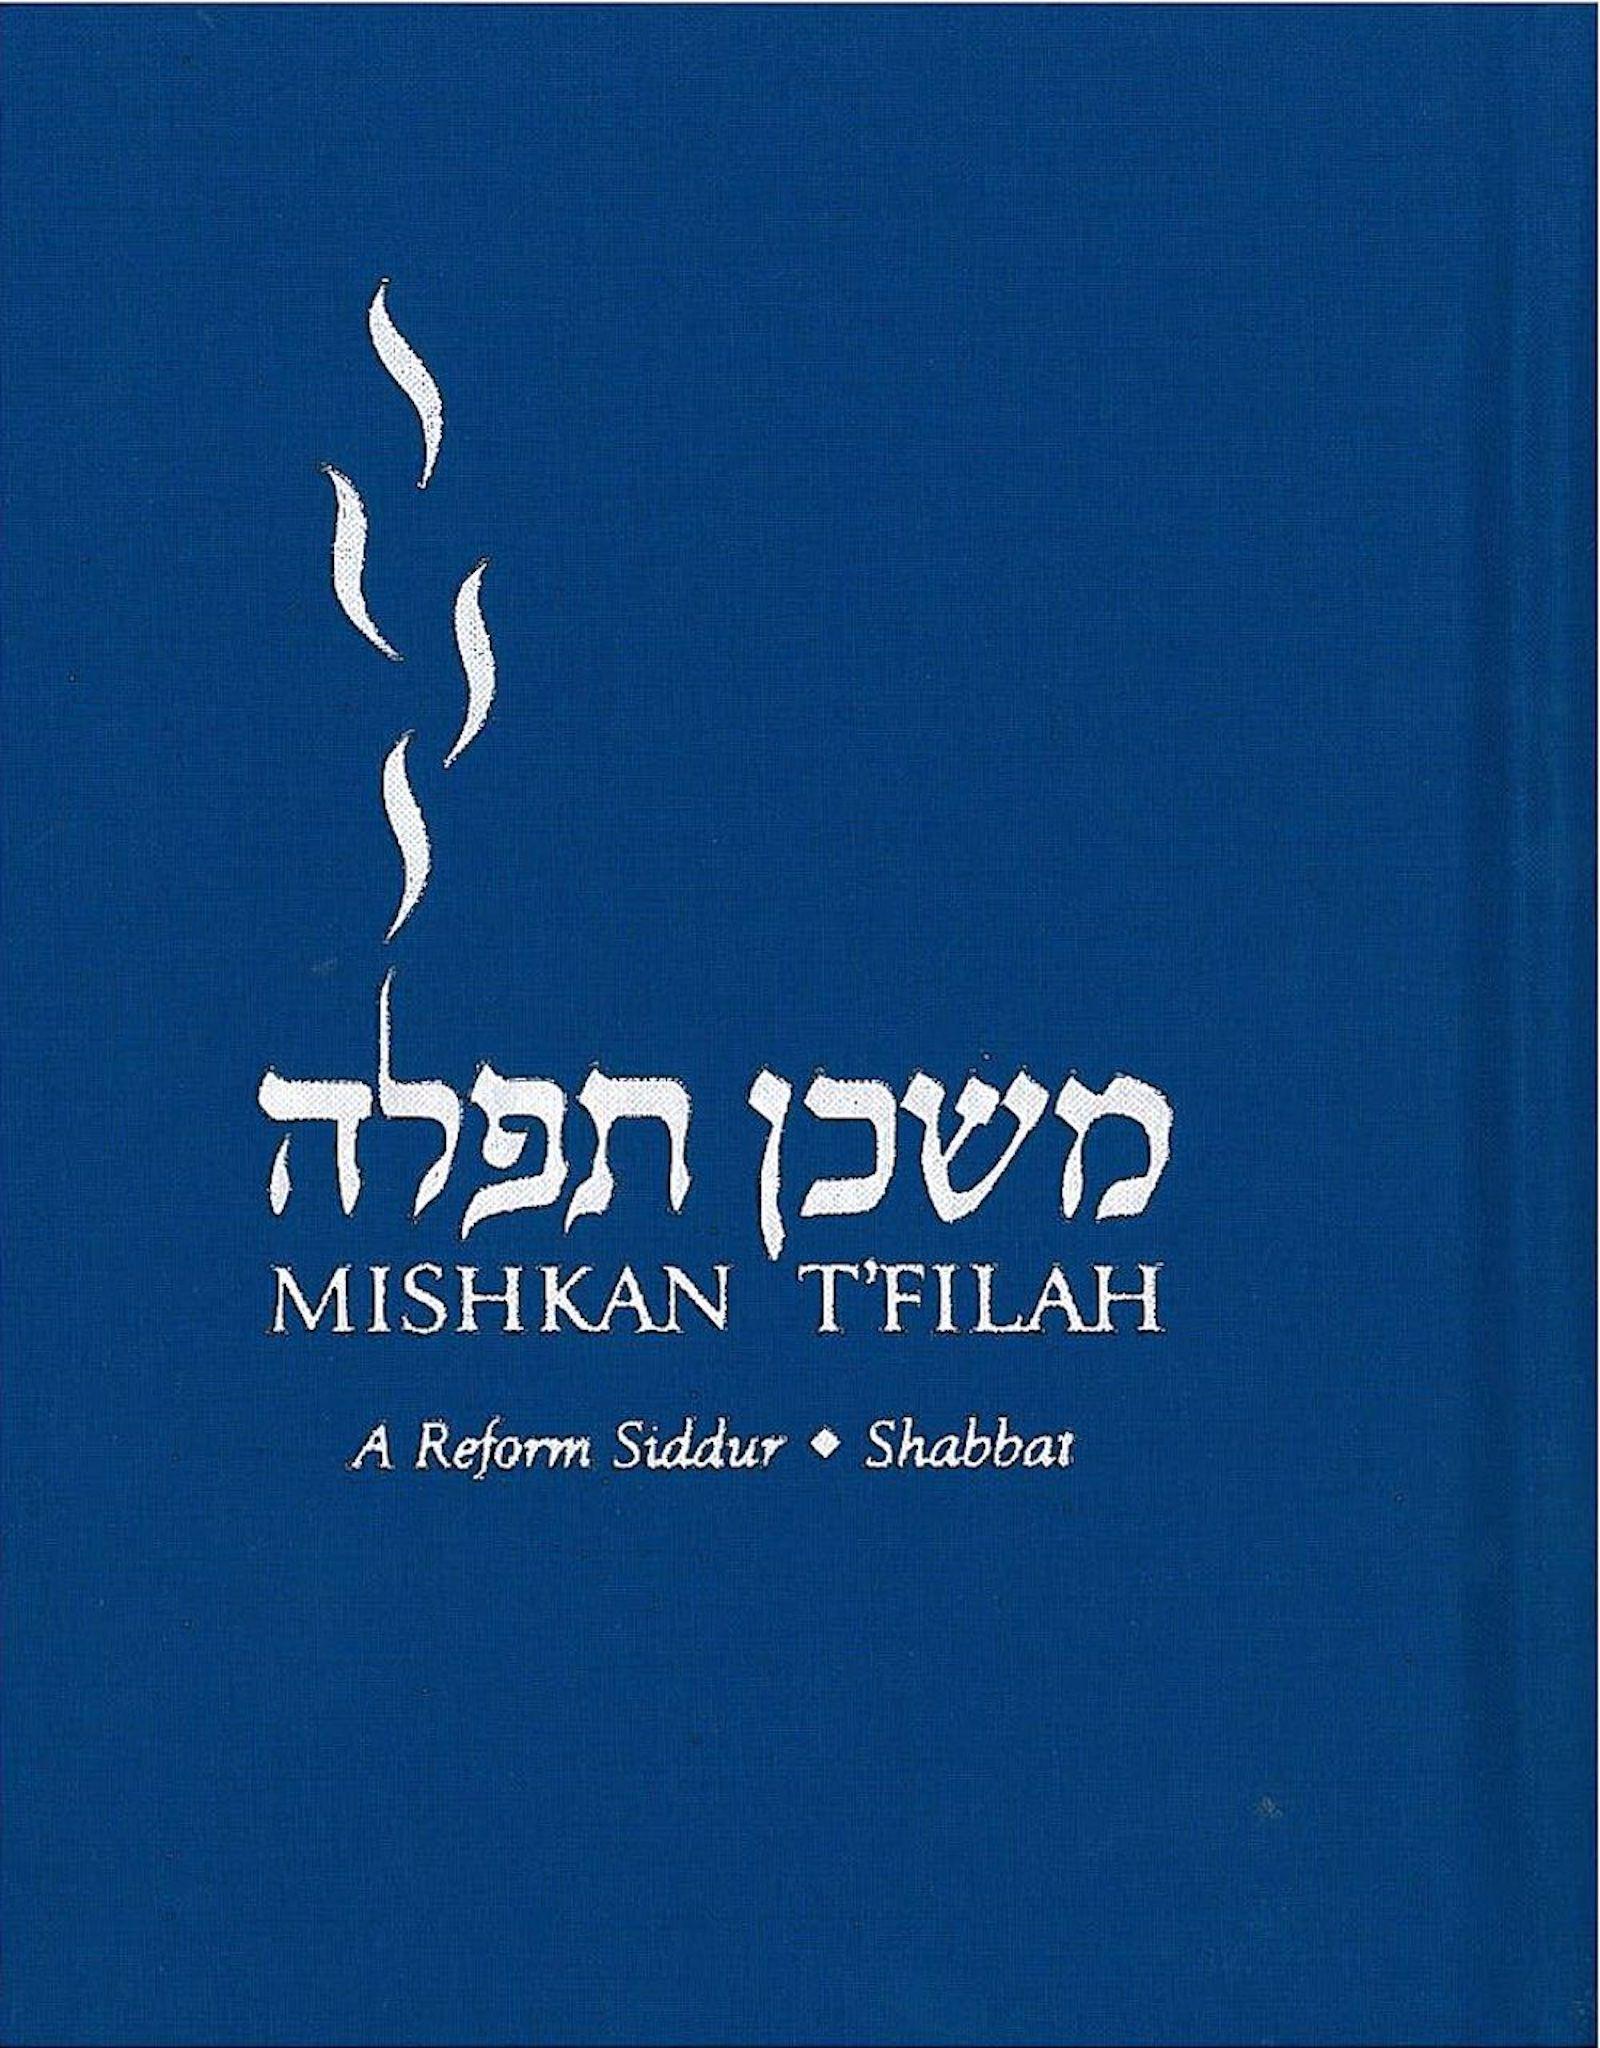 Mishkan T'filah: Shabbat, non-transliterated